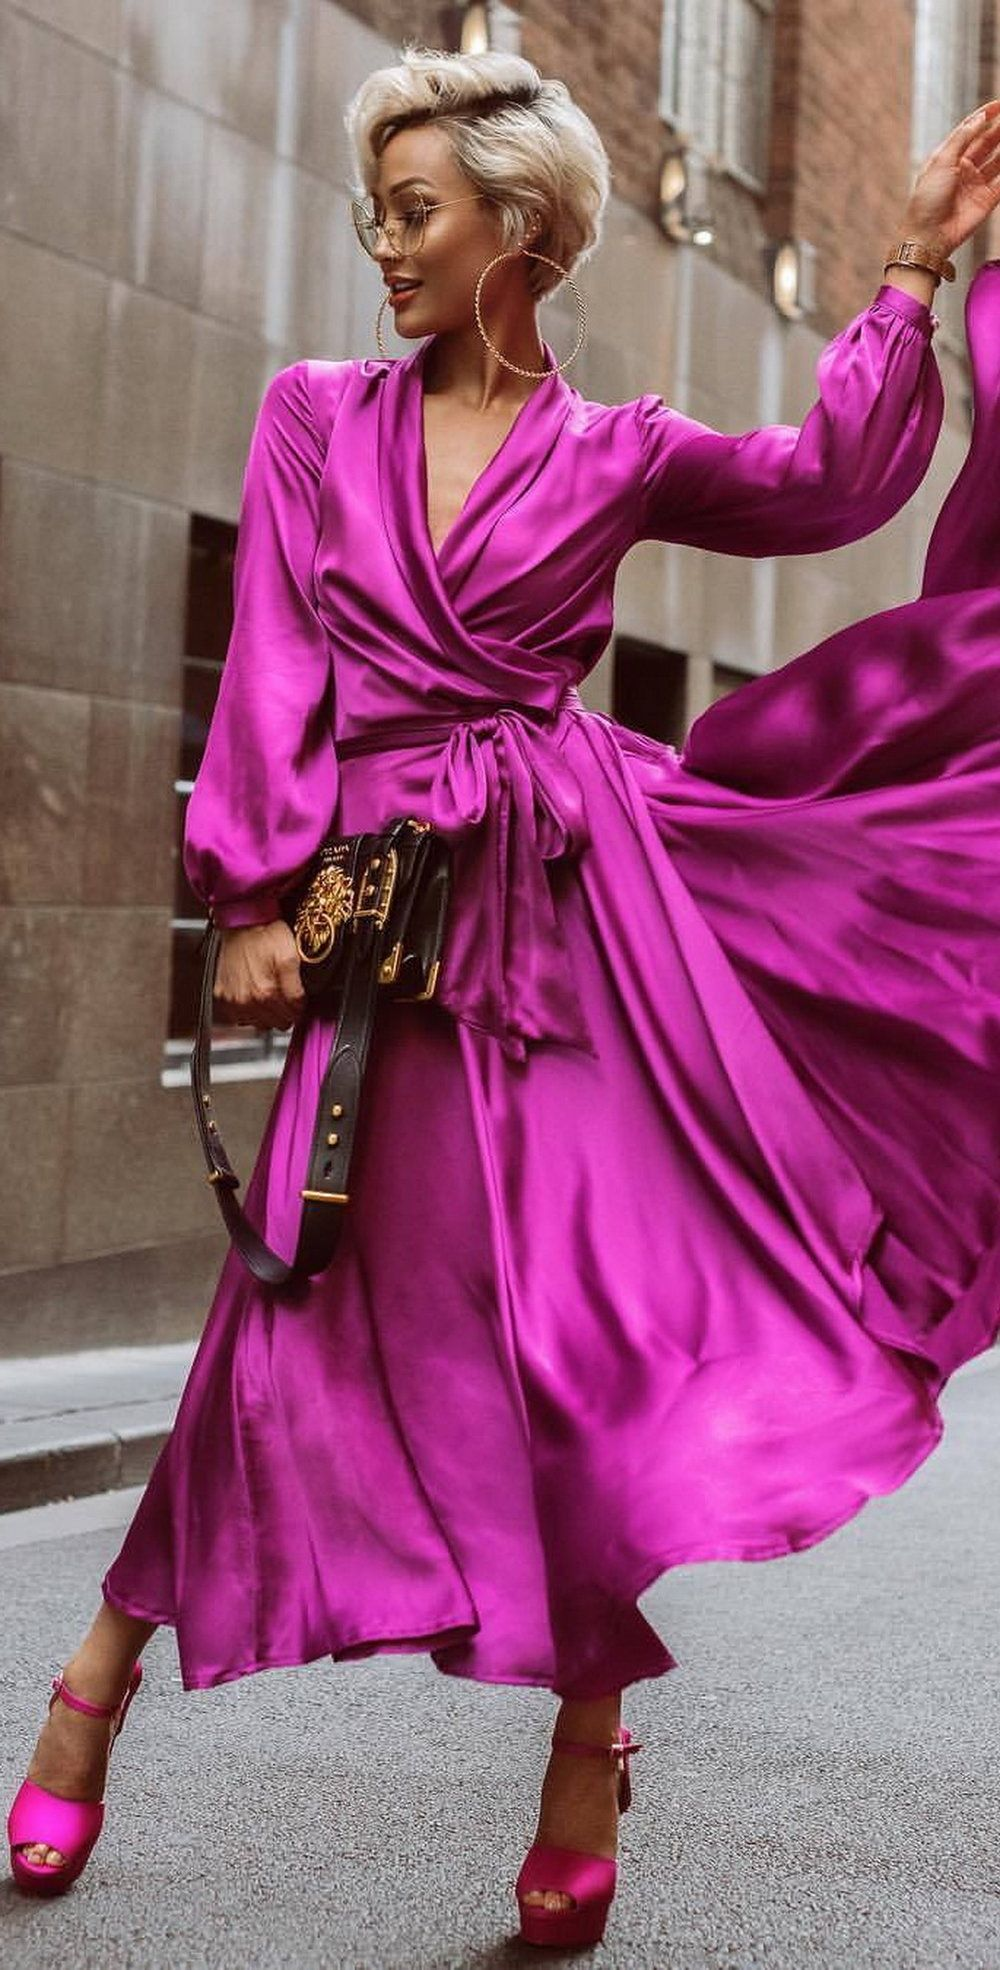 40 Fresh Winter Outfits To 📲 Now | Pinterest | La invitada, Alta ...